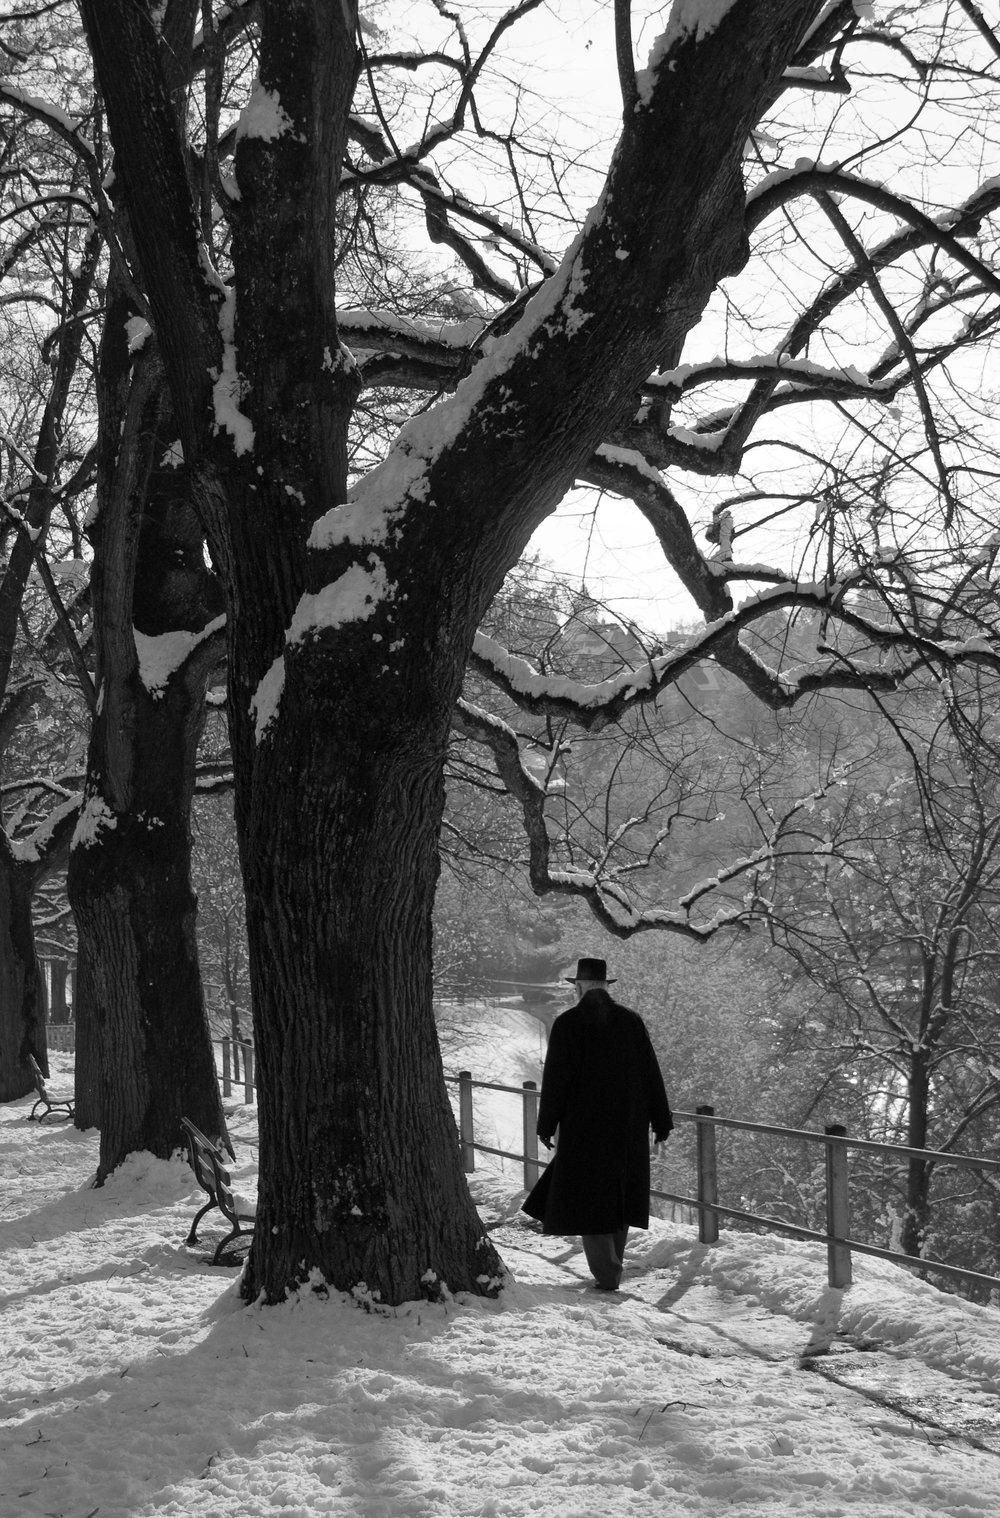 A man walks in the winter snow. Bern, Switzerland.